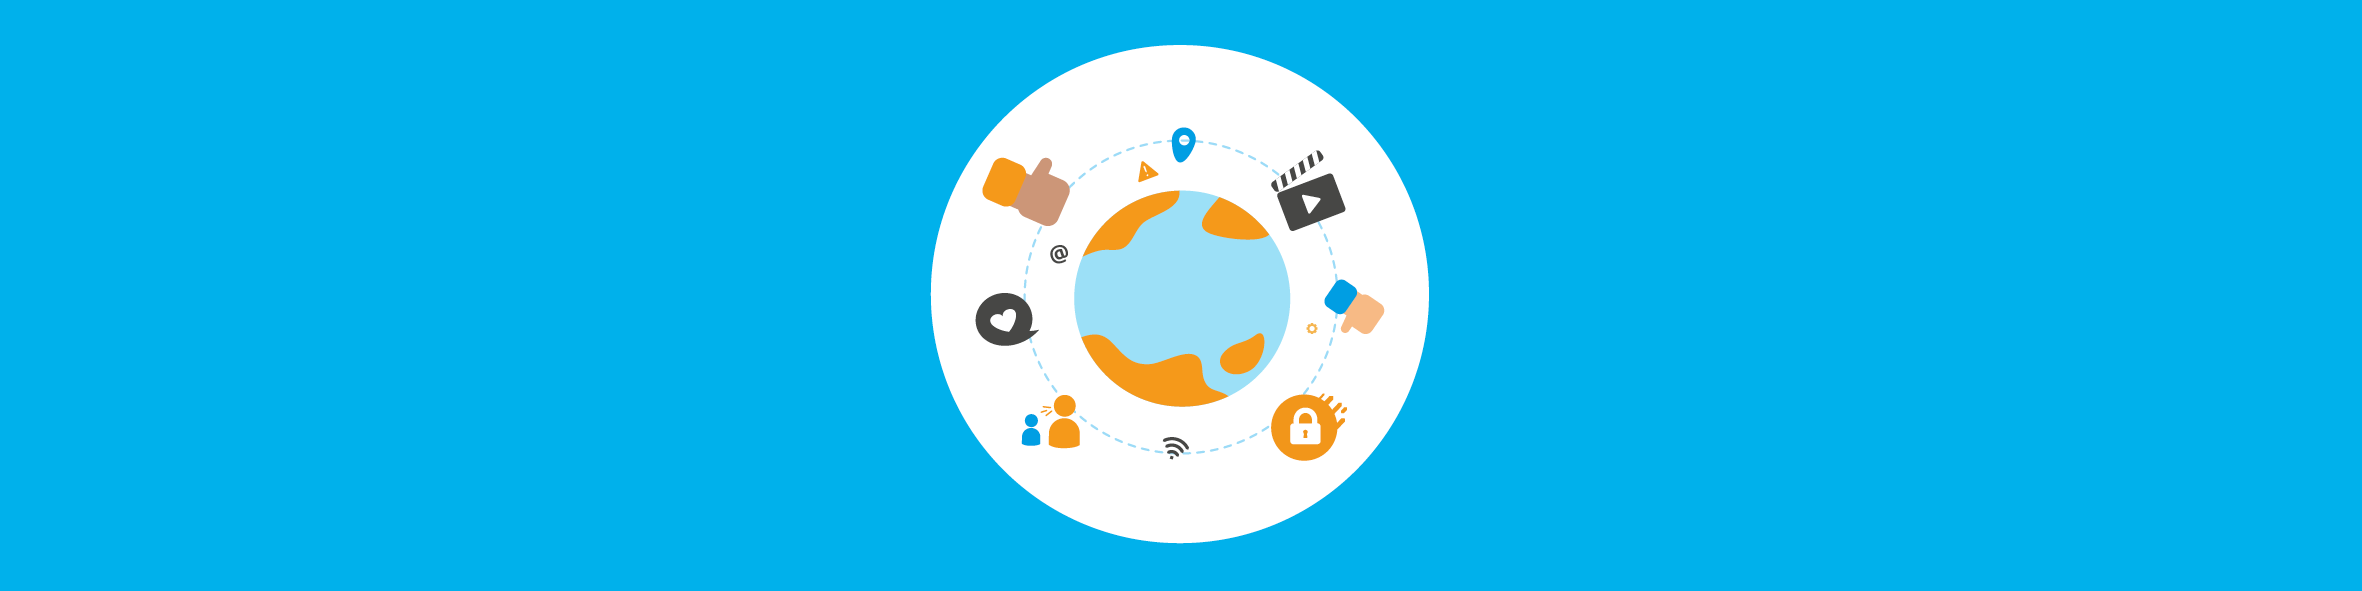 Mediawijsheid - Cloudwise Academy header trainingsaanbod